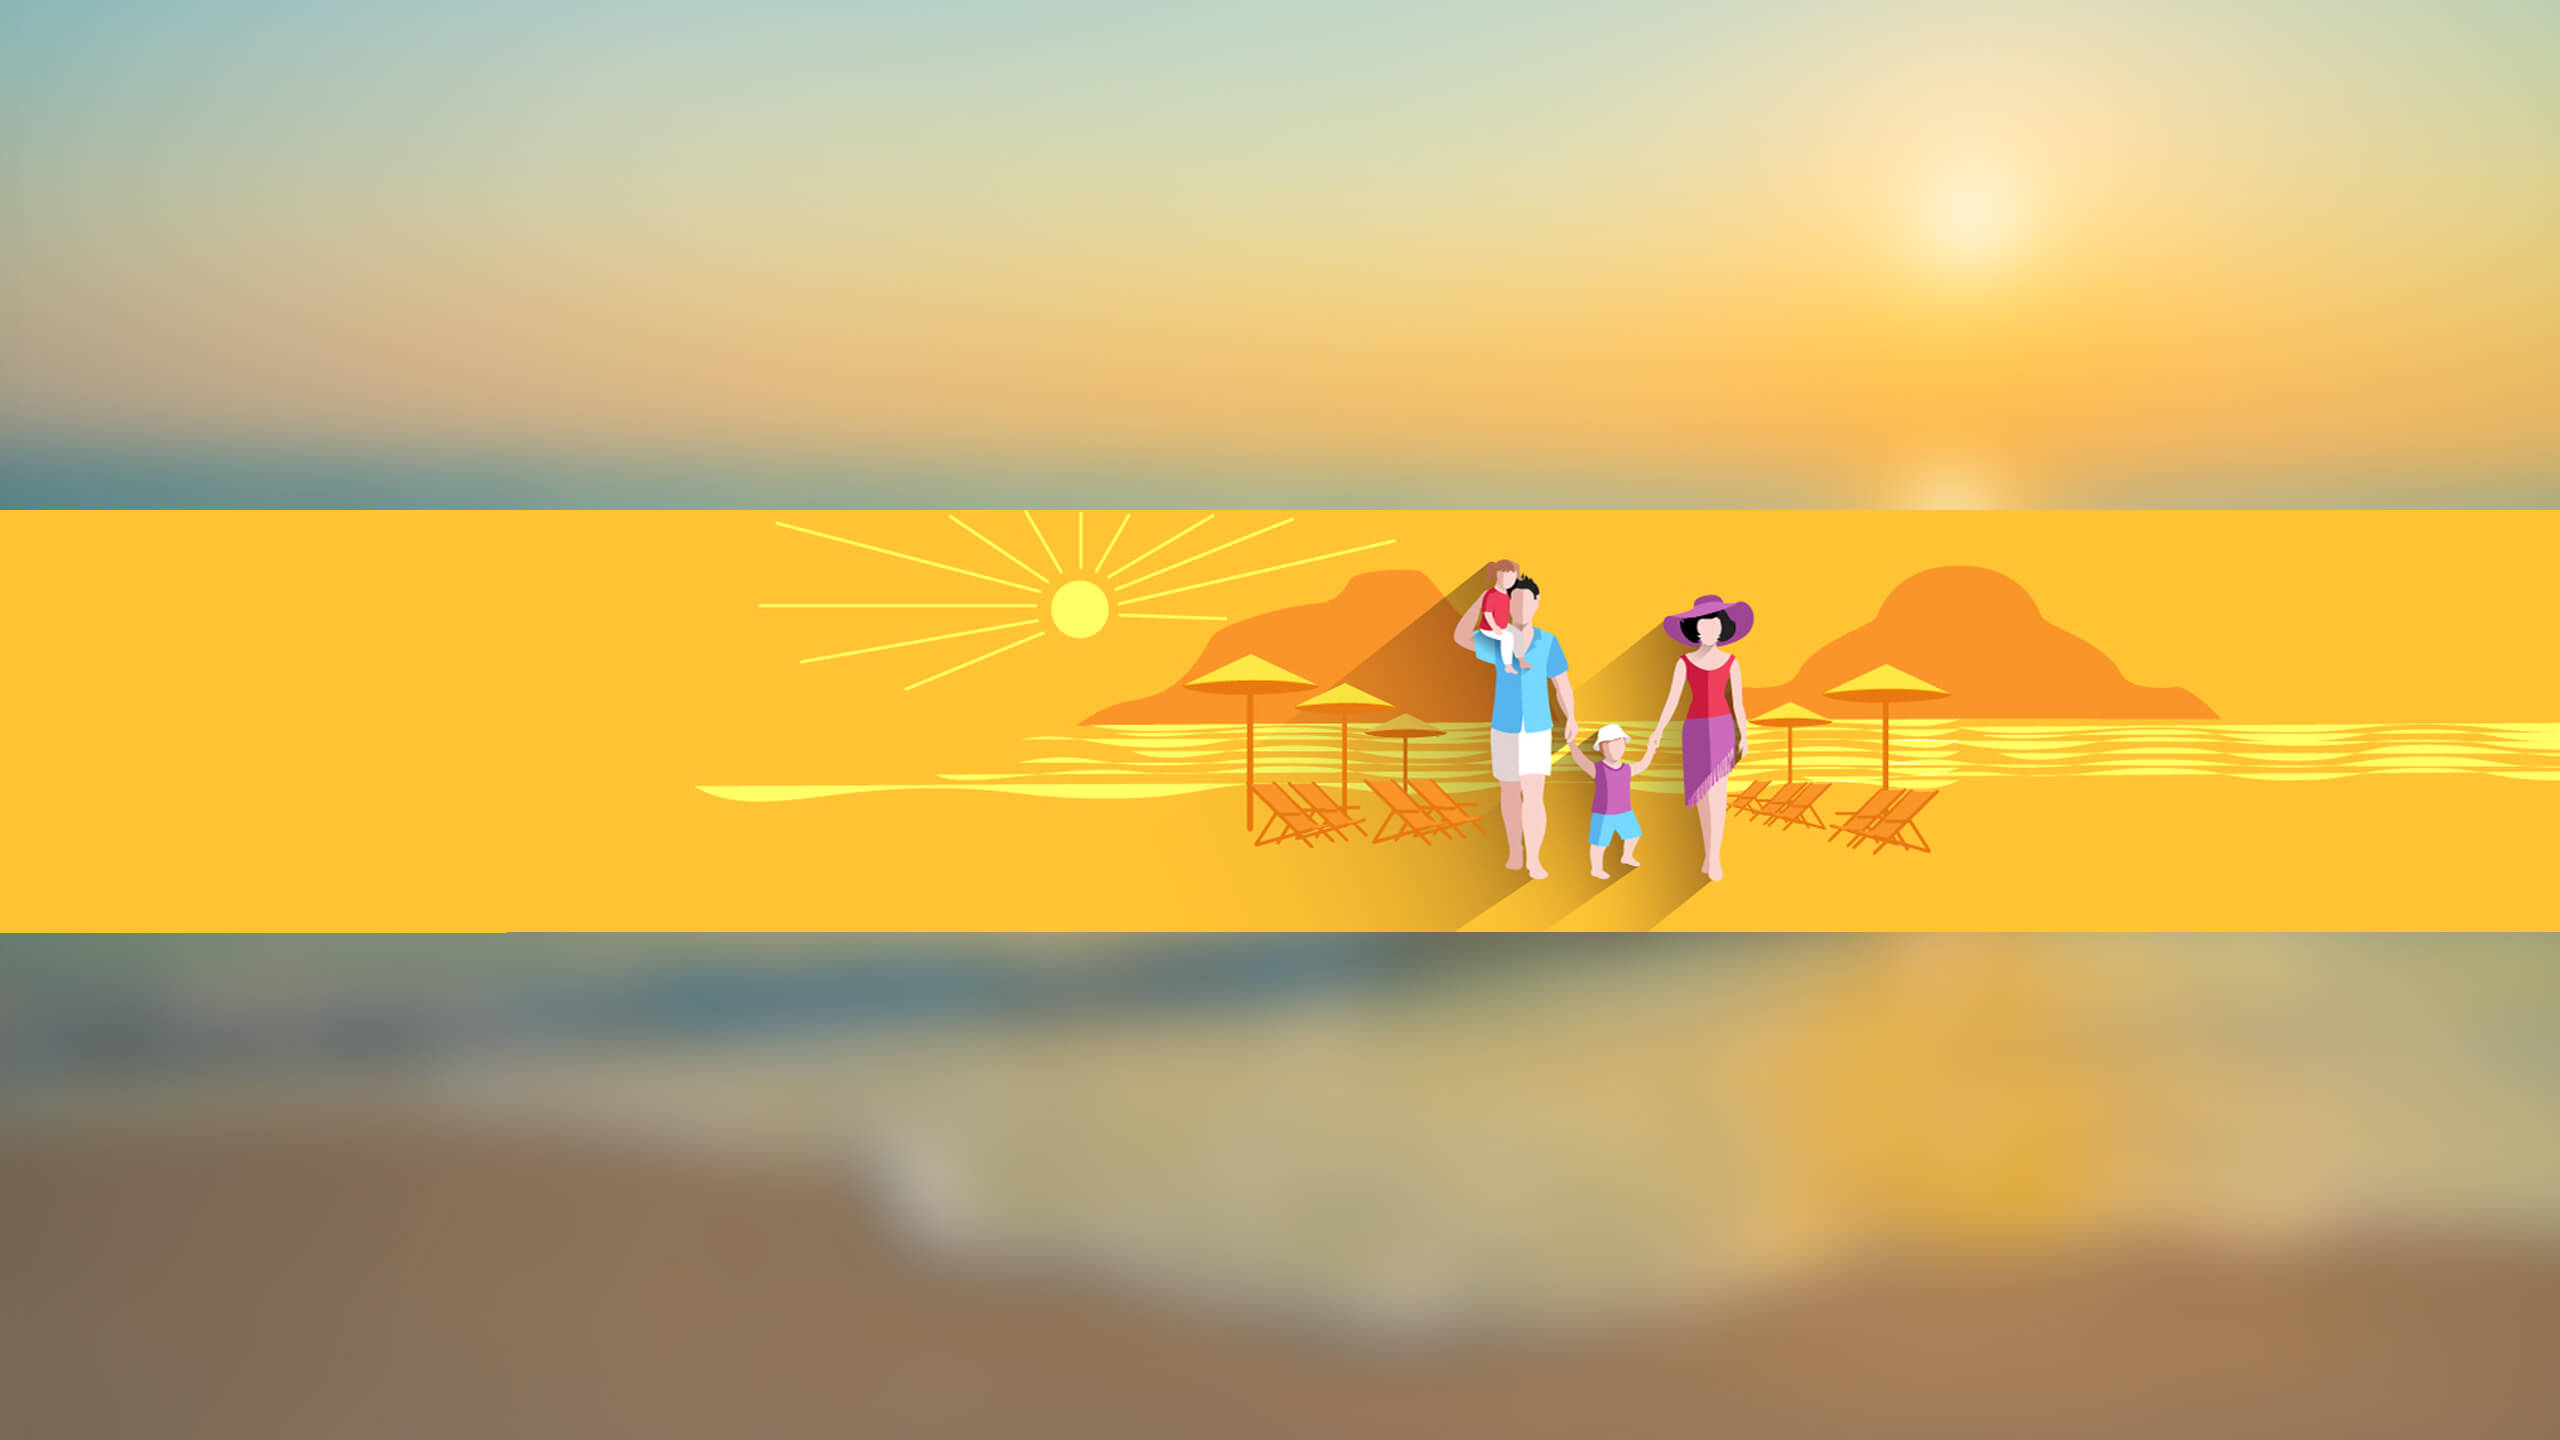 Жёлтая картинка для ютуба люди на песчаном пляже